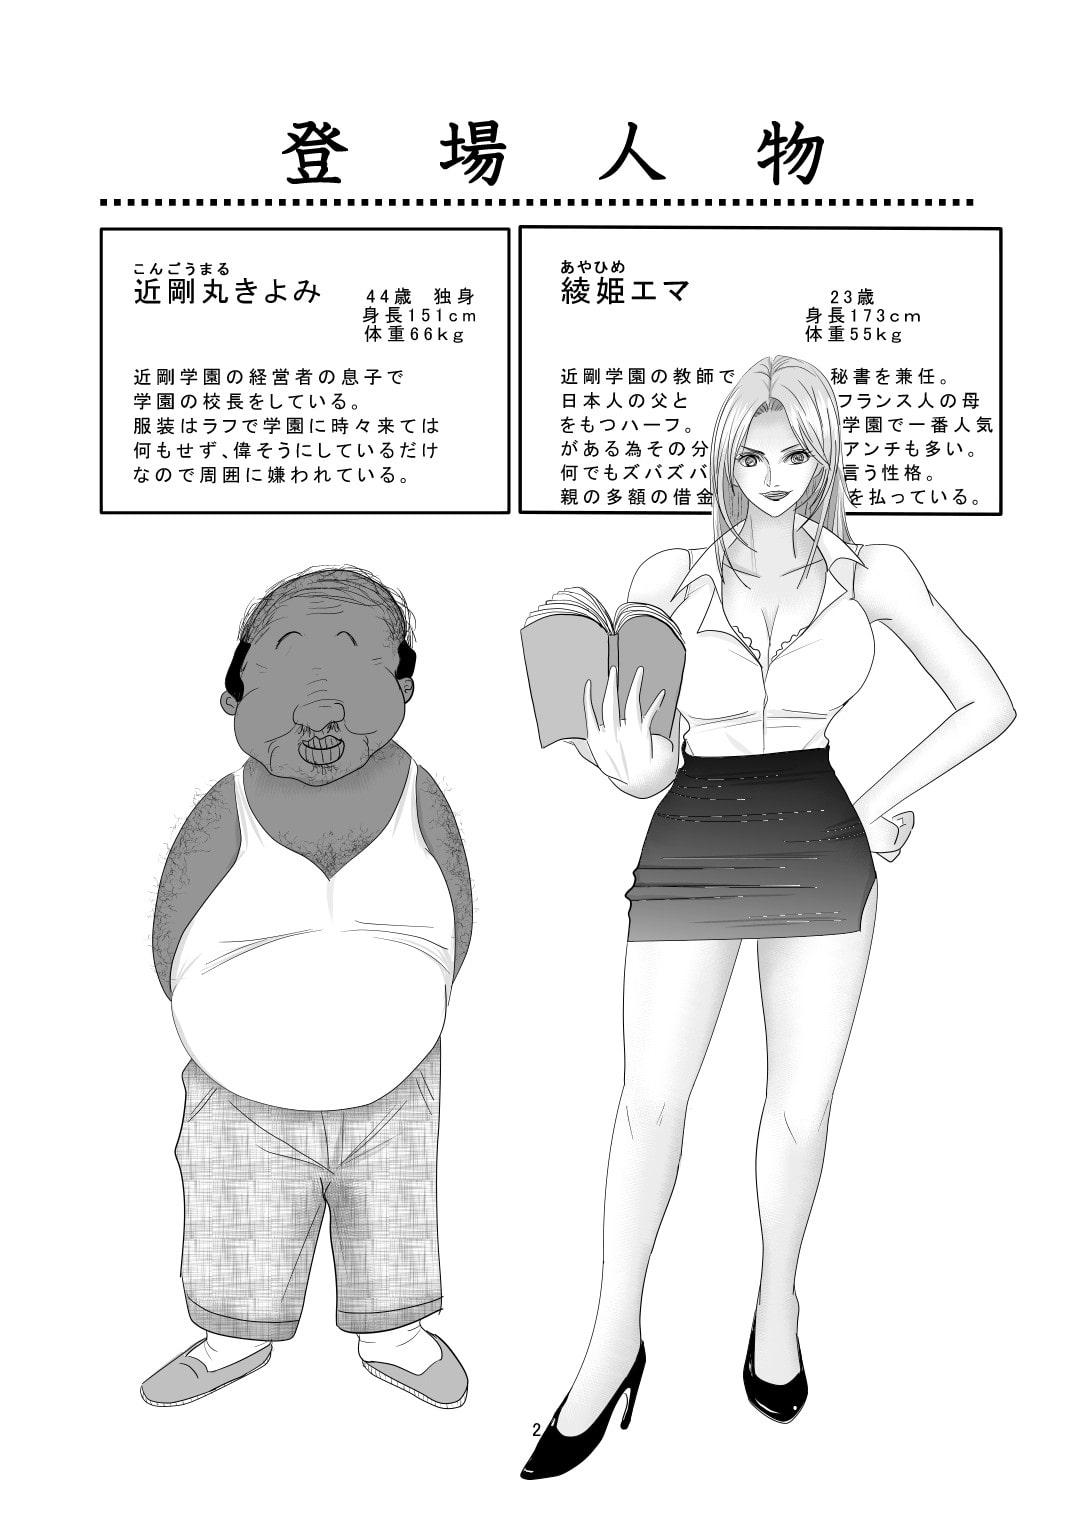 DLsite専売綾姫先生の憂鬱(1)